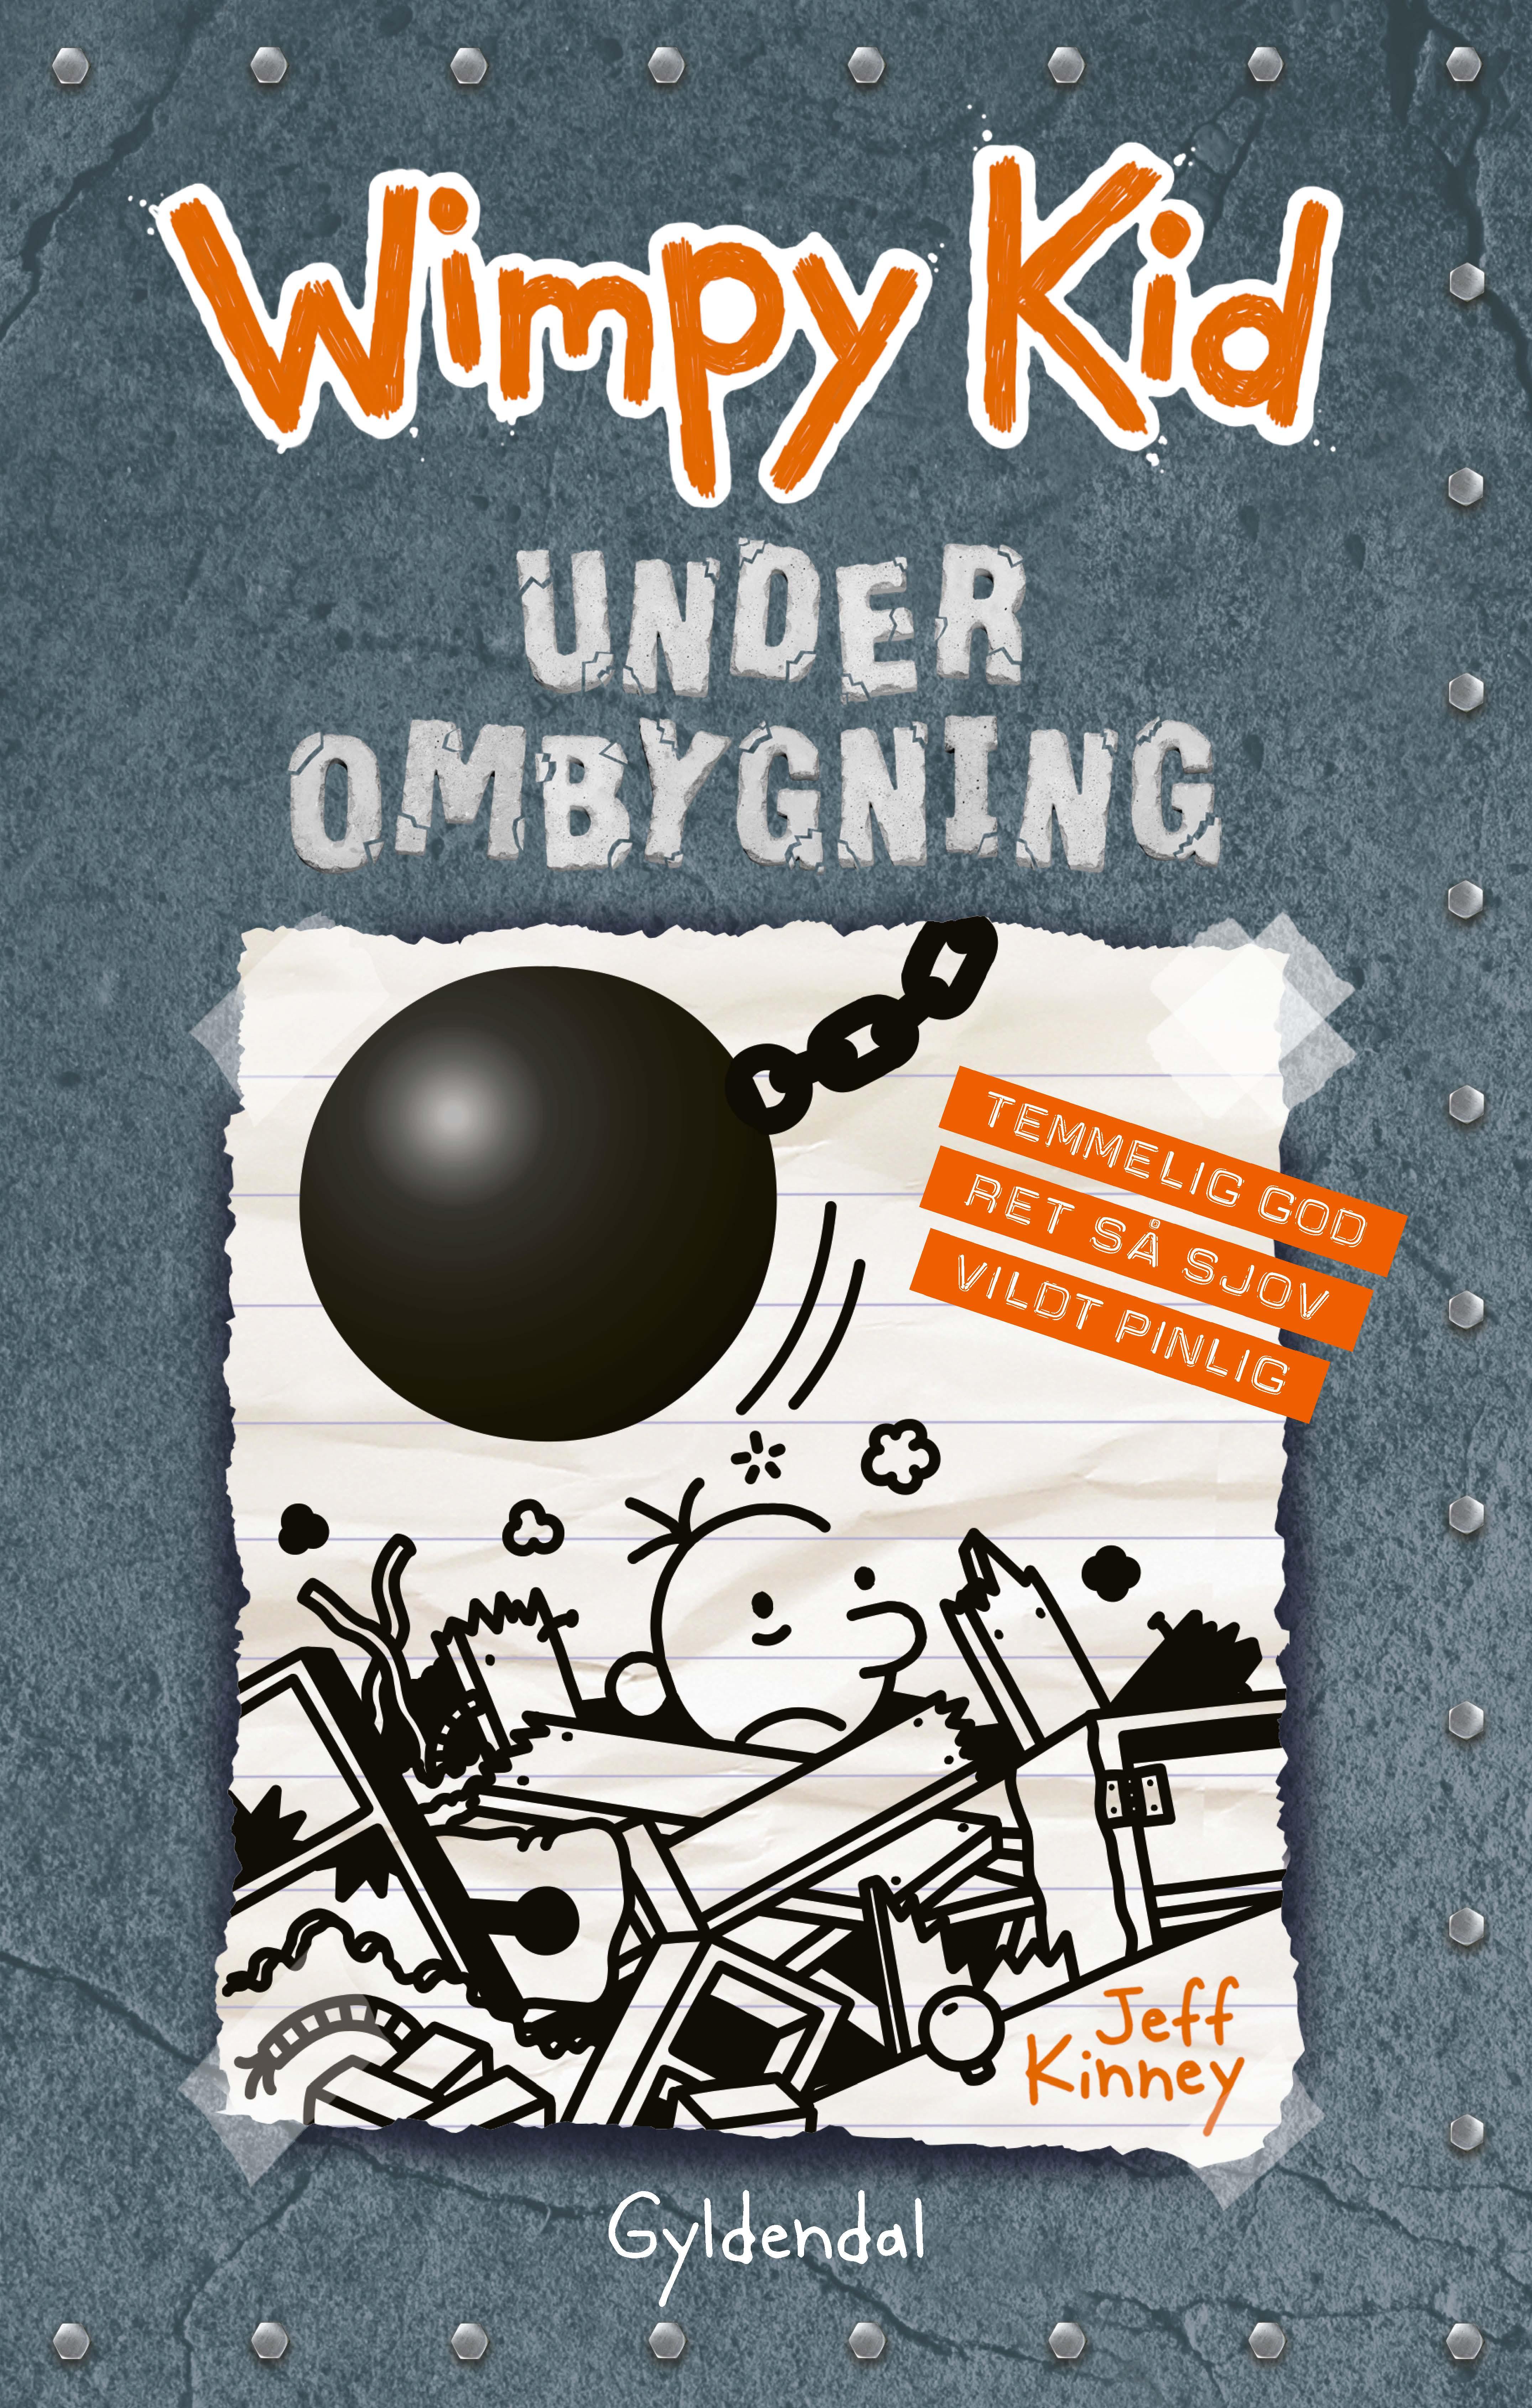 Wimpy kid: Wimpy Kid 14 - Under ombygning - Jeff Kinney - Bøger - Gyldendal - 9788702277104 - 27/1-2020